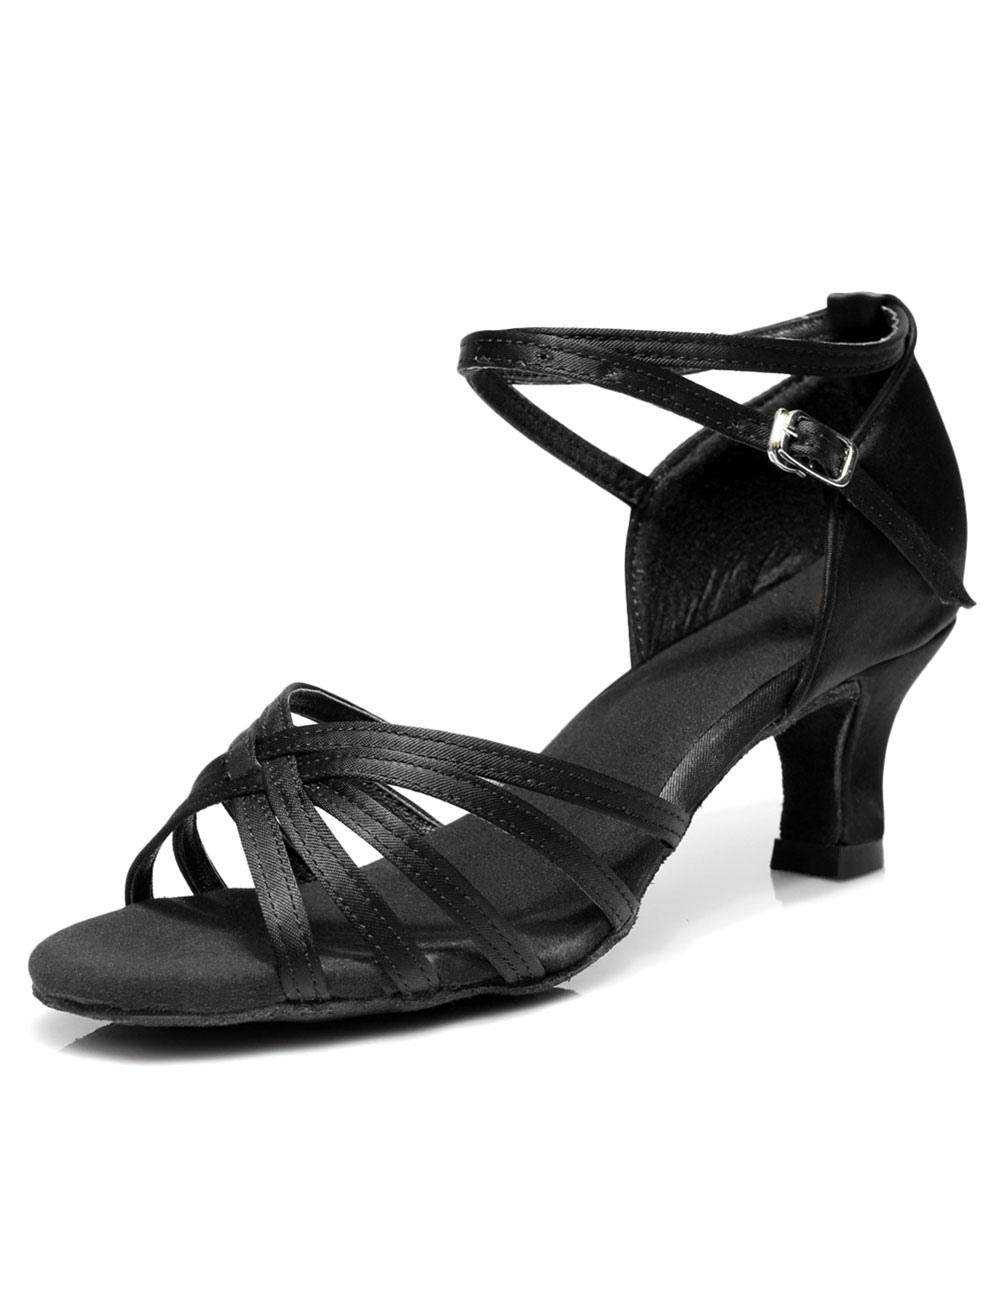 Buy Latin Dancing Shoes Satin Criss Cross Ballroom Shoes For Women for $15.63 in Milanoo store